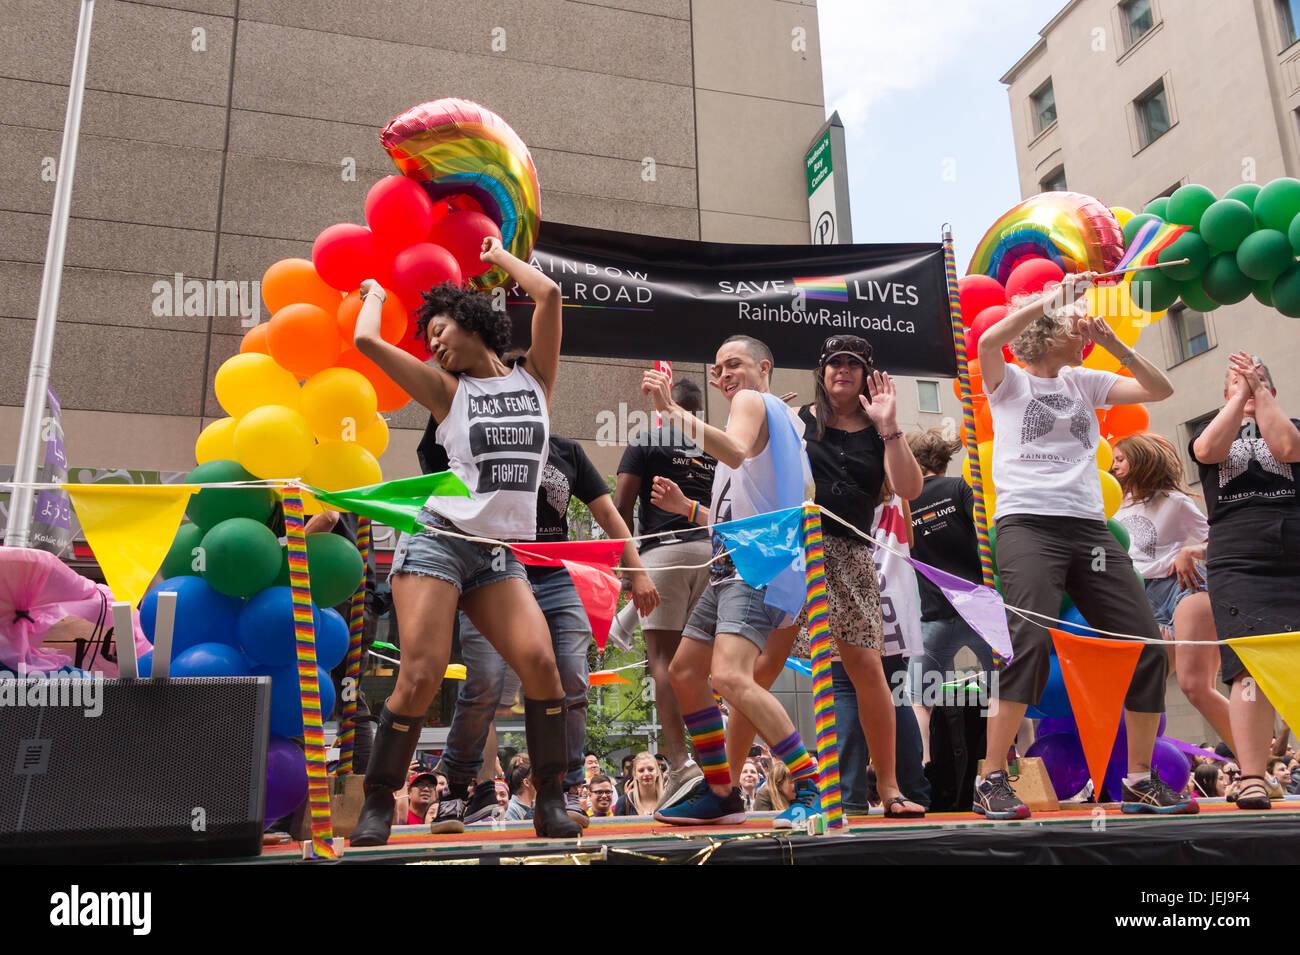 Toronto, Kanada. 25. Juni 2017. Menschen nehmen an Toronto Pride Parade Teil. Bildnachweis: Marc Bruxelle/Alamy Stockbild